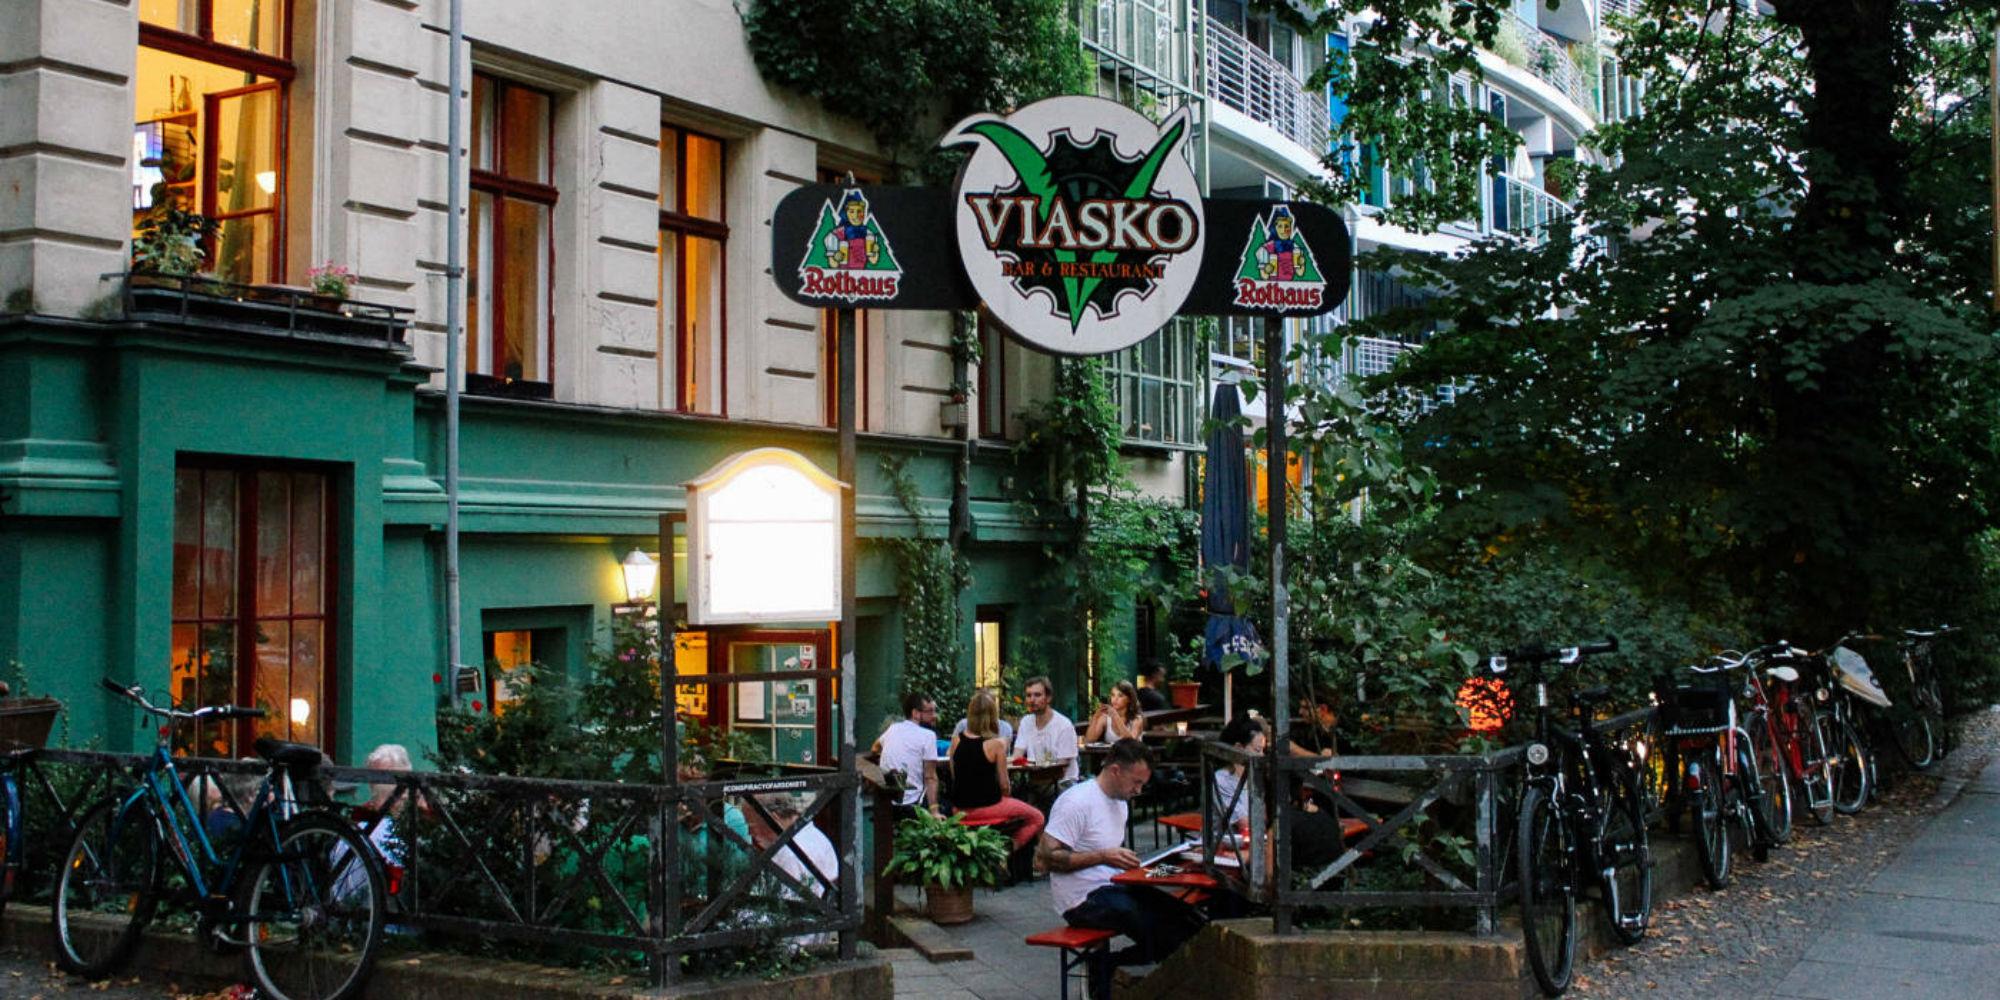 brunch Berlin Viasko brunch